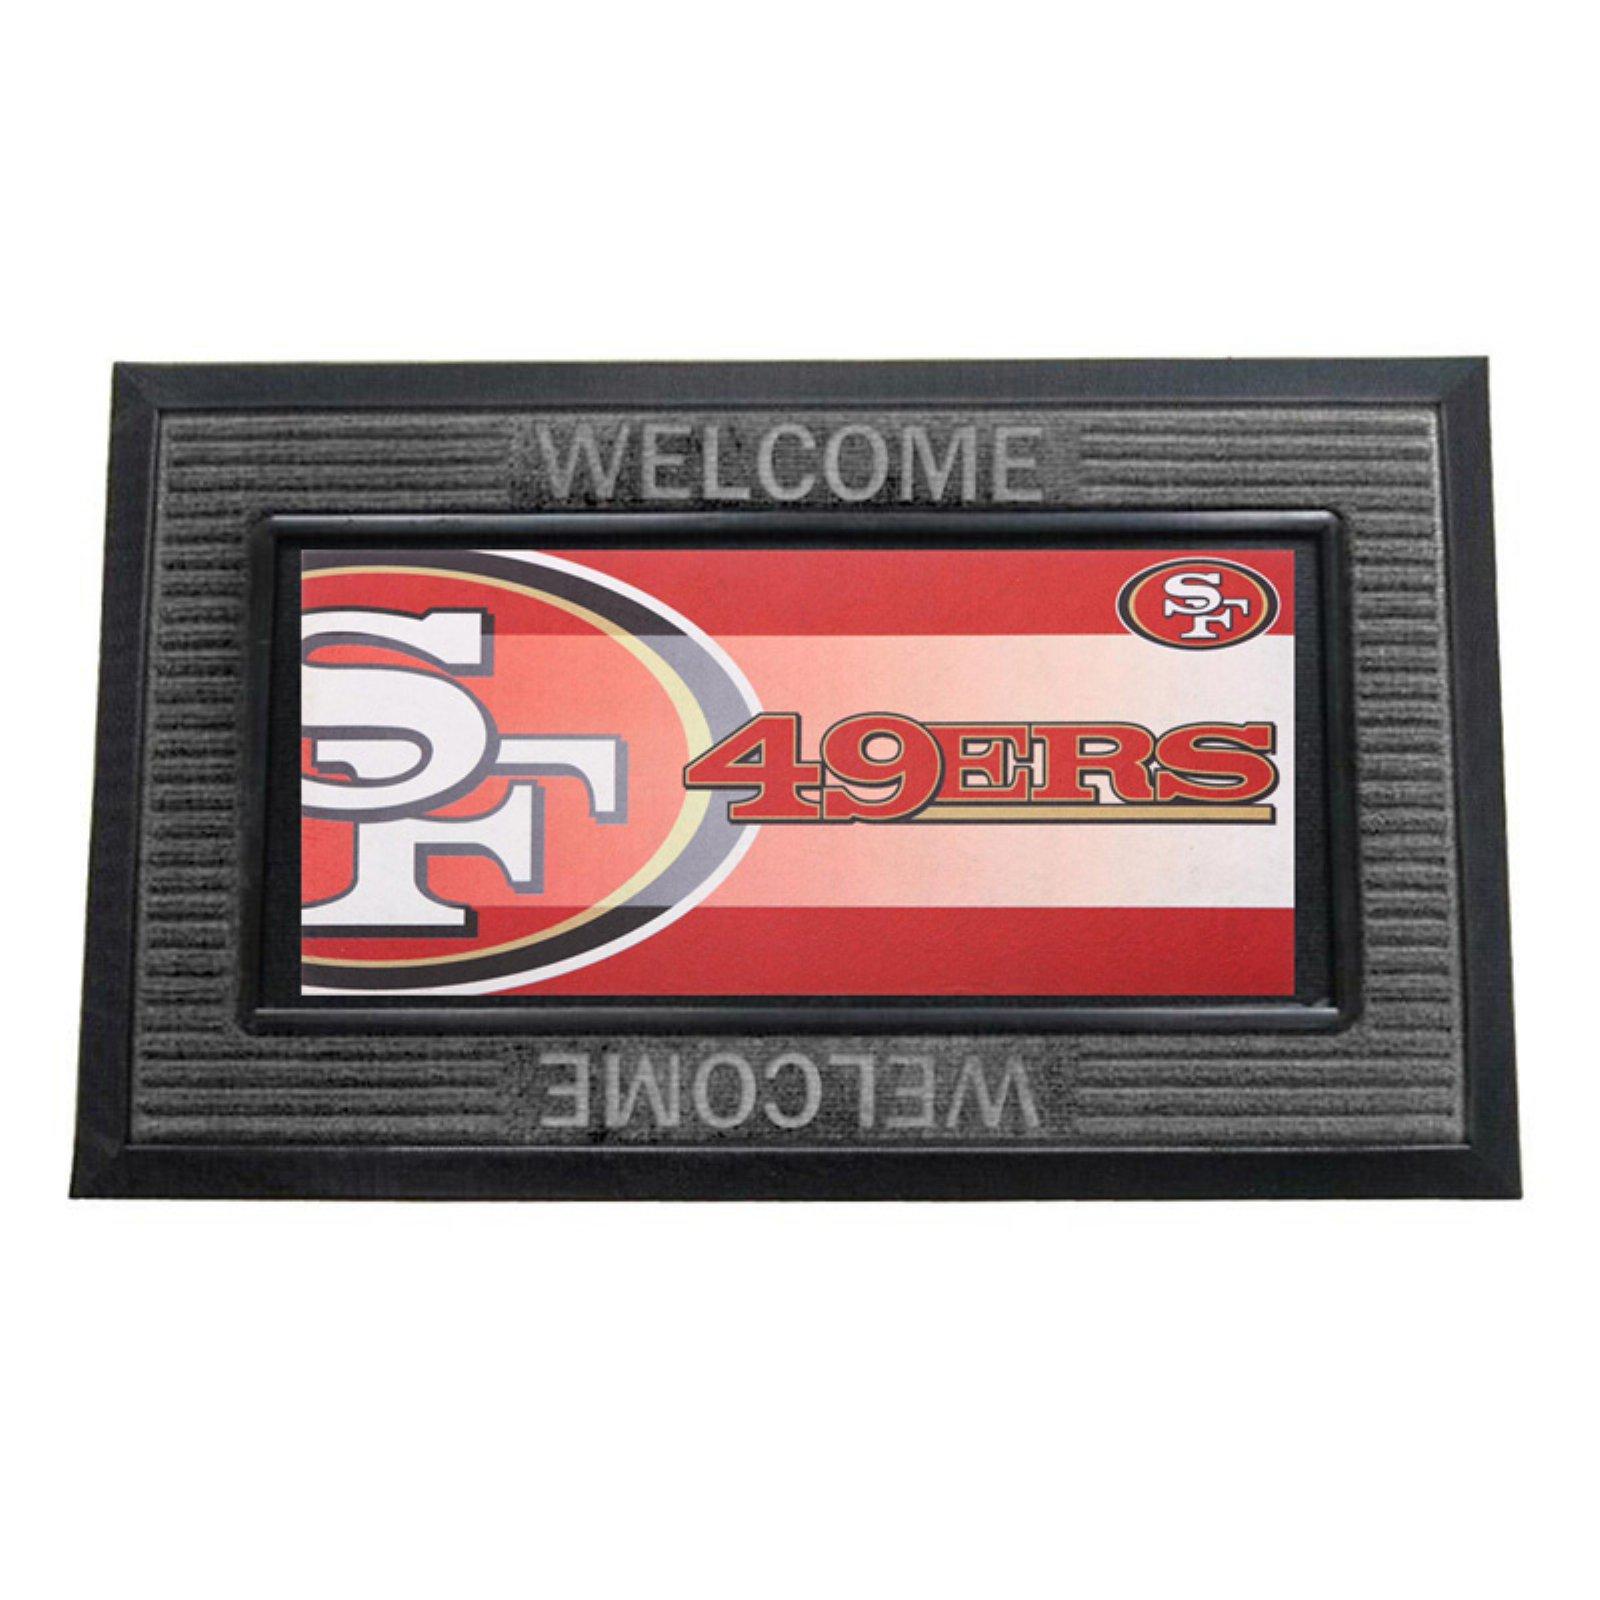 Team Sports America NFL Football Welcome Diamond Decorative Doormat